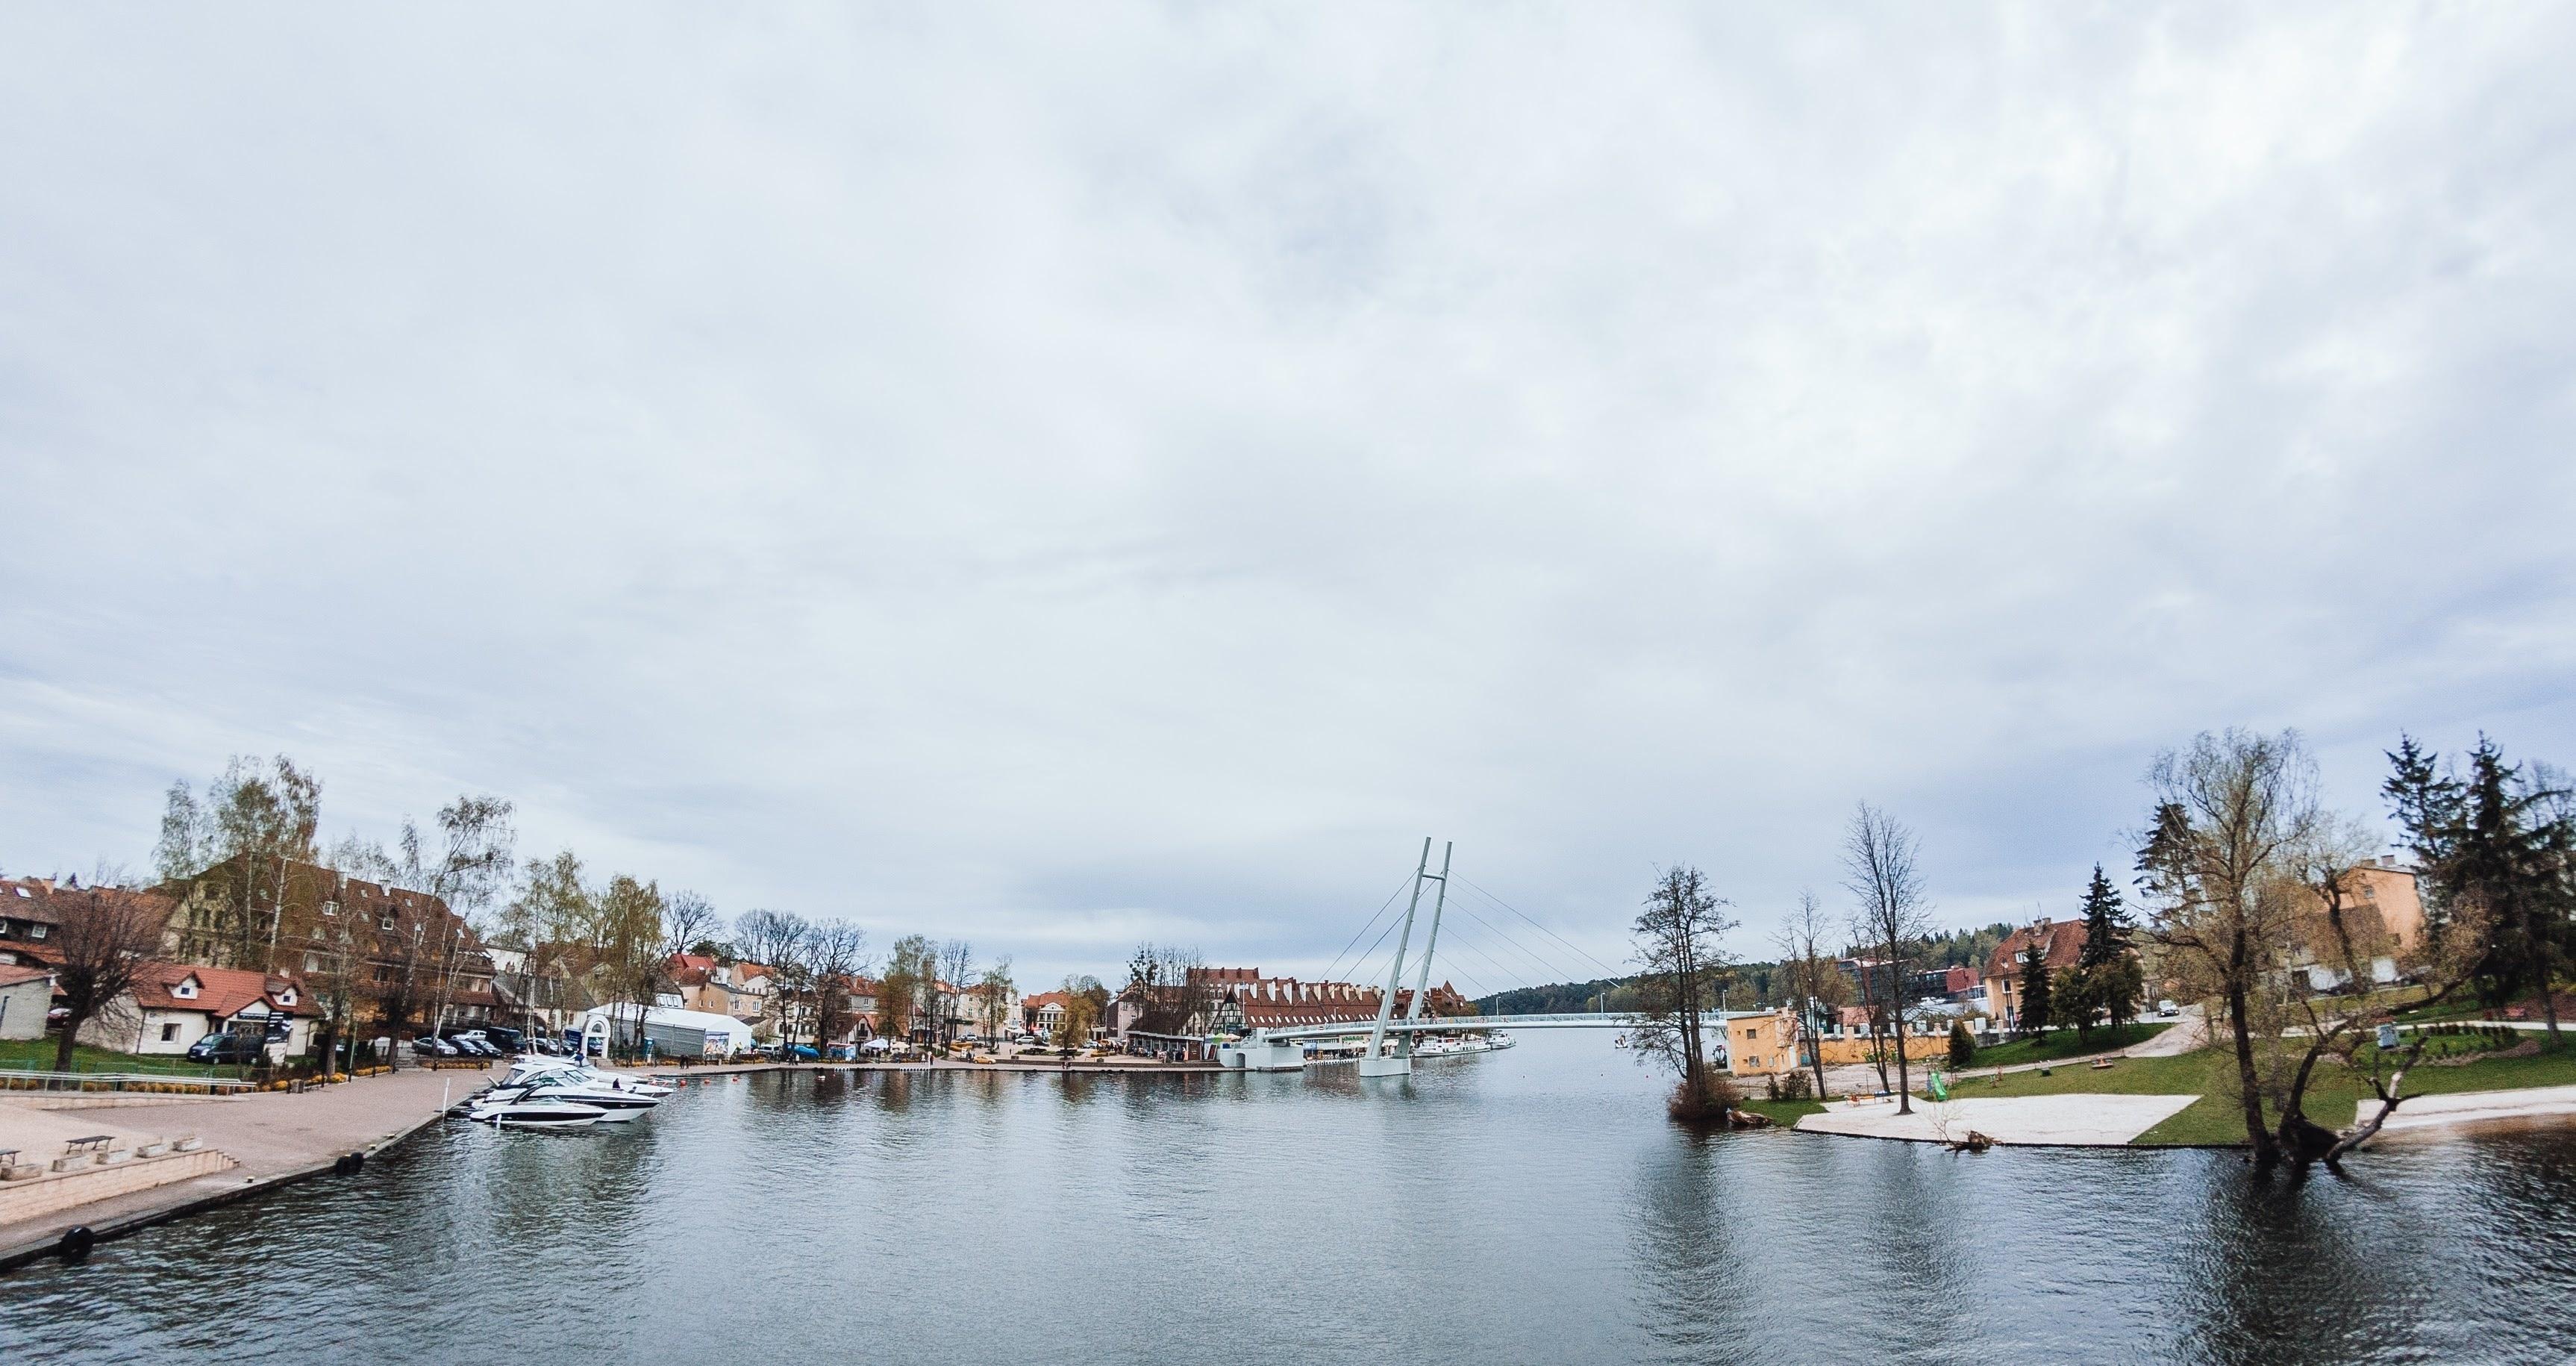 Kuchenka-sjøen, Mikolajki, Ermlandskmasuriske voivodskap, Polen